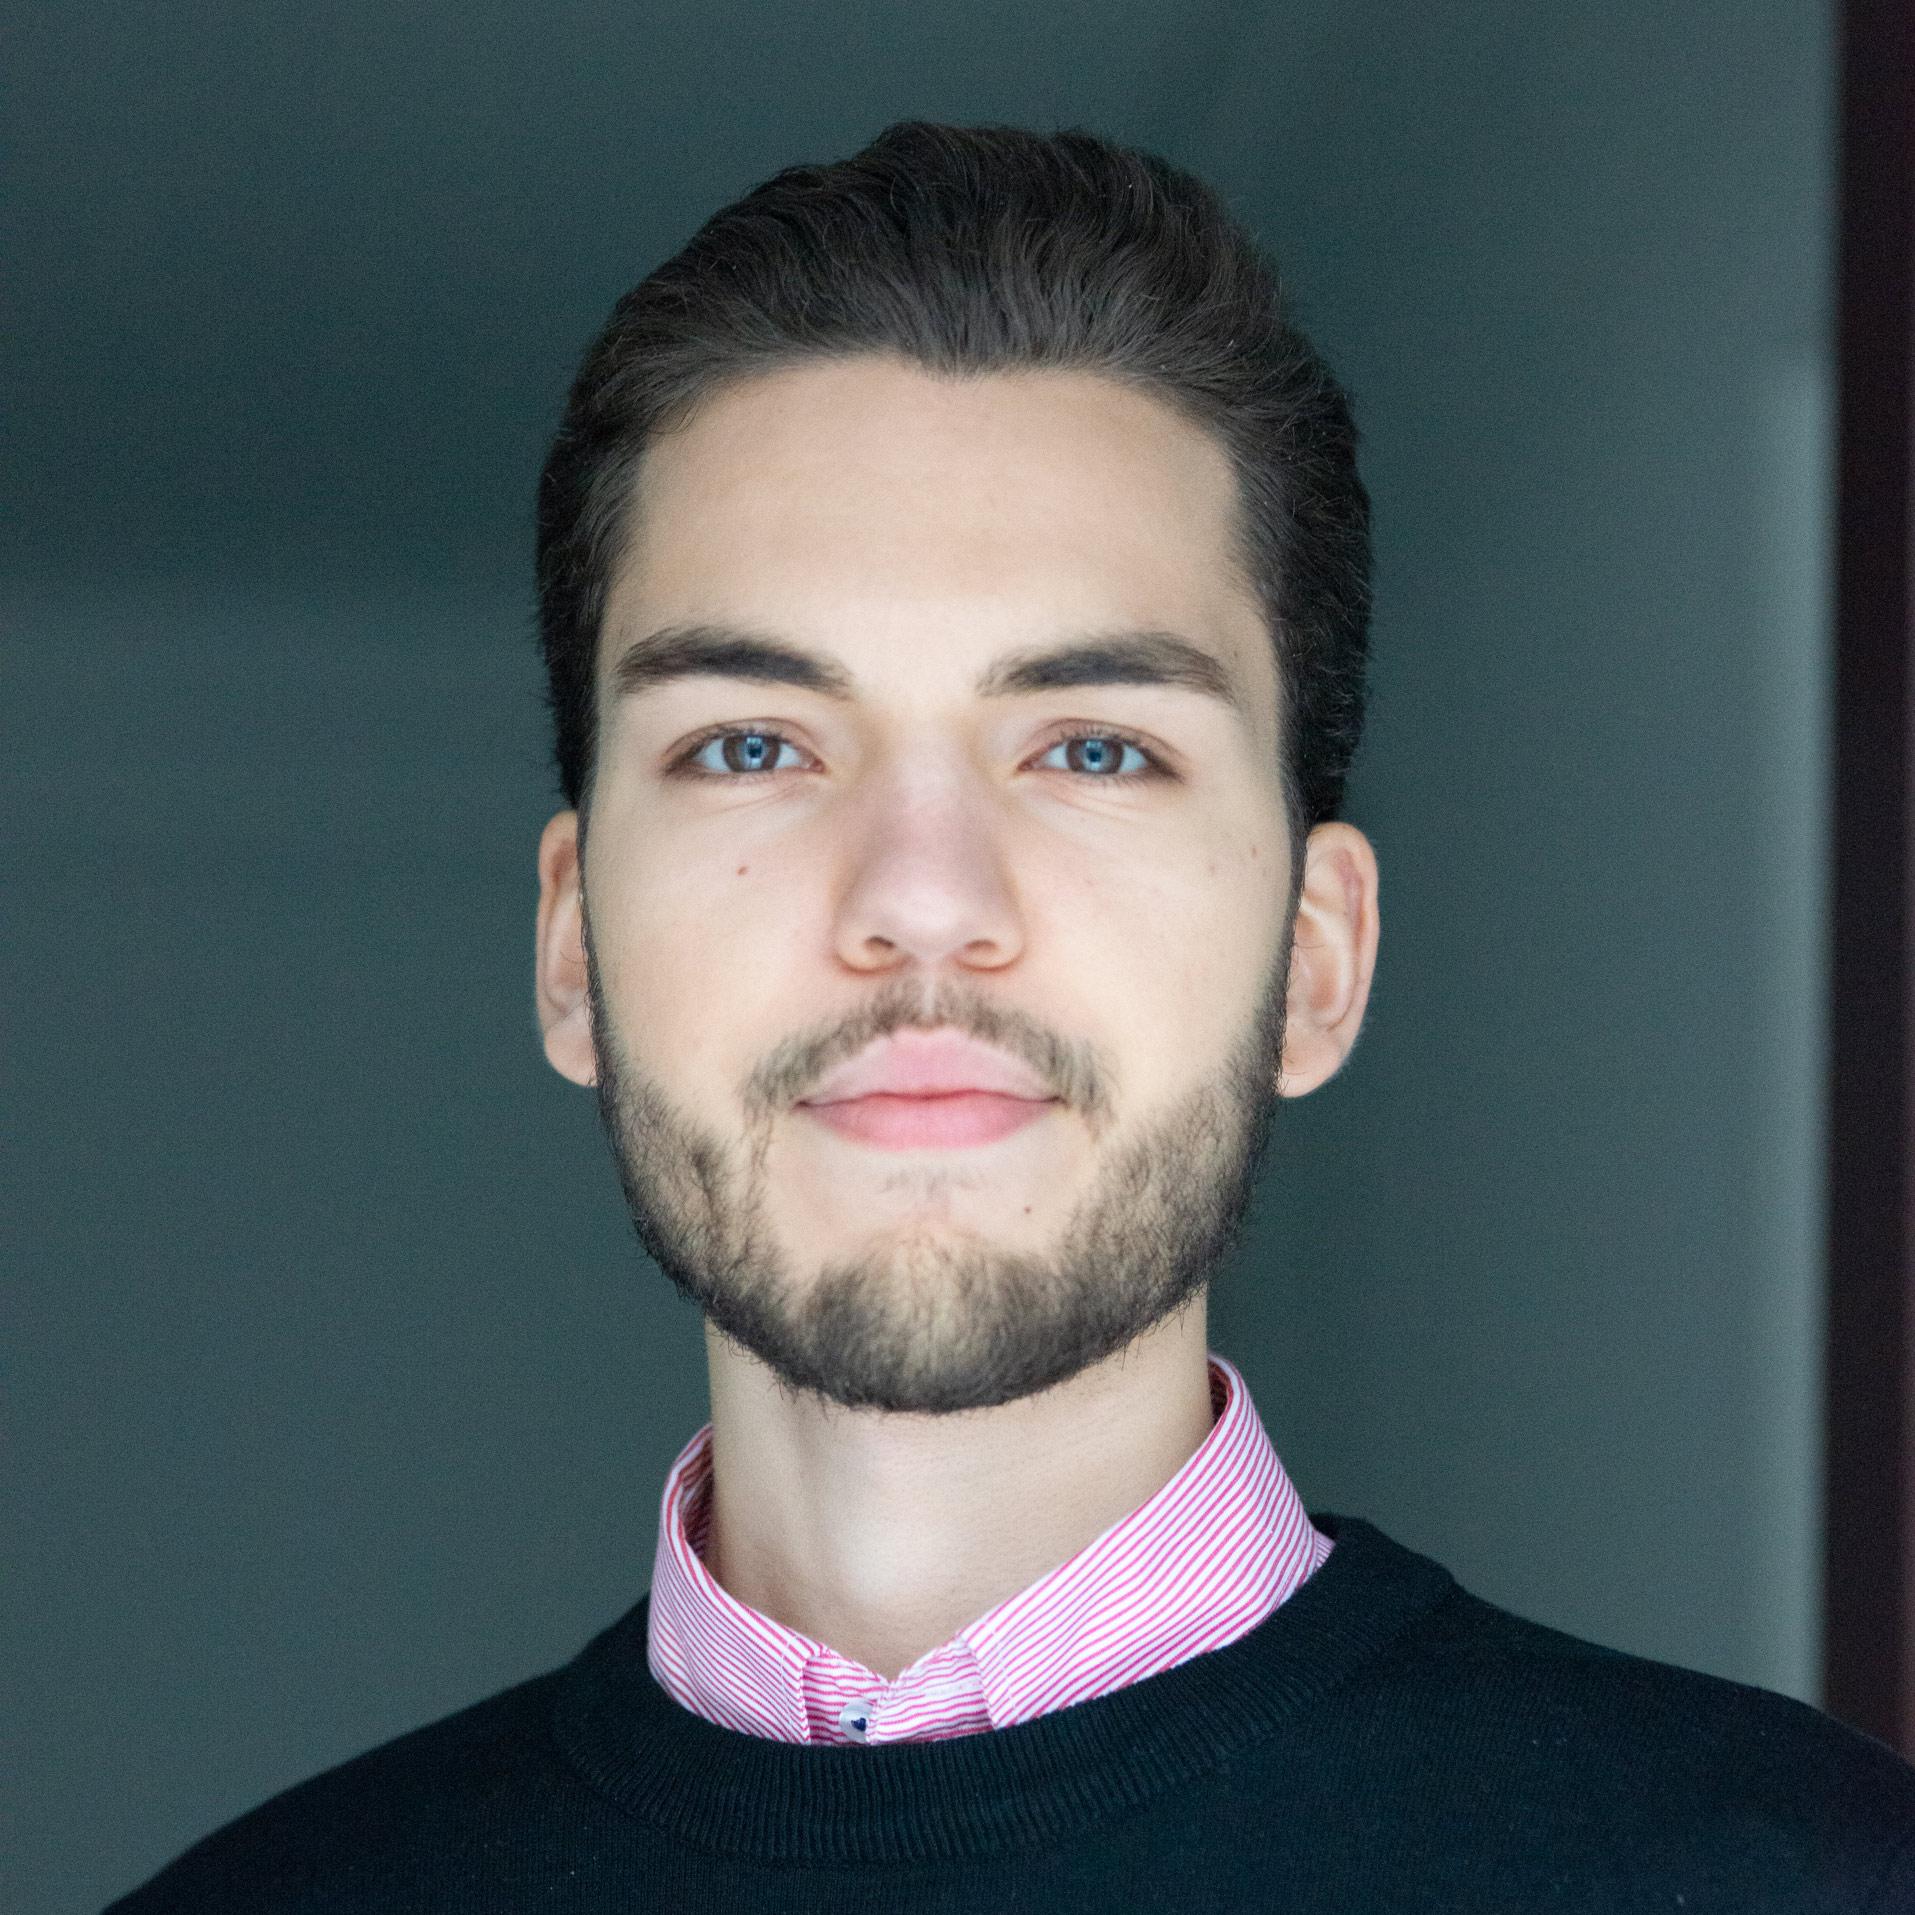 Dominick Karstedt